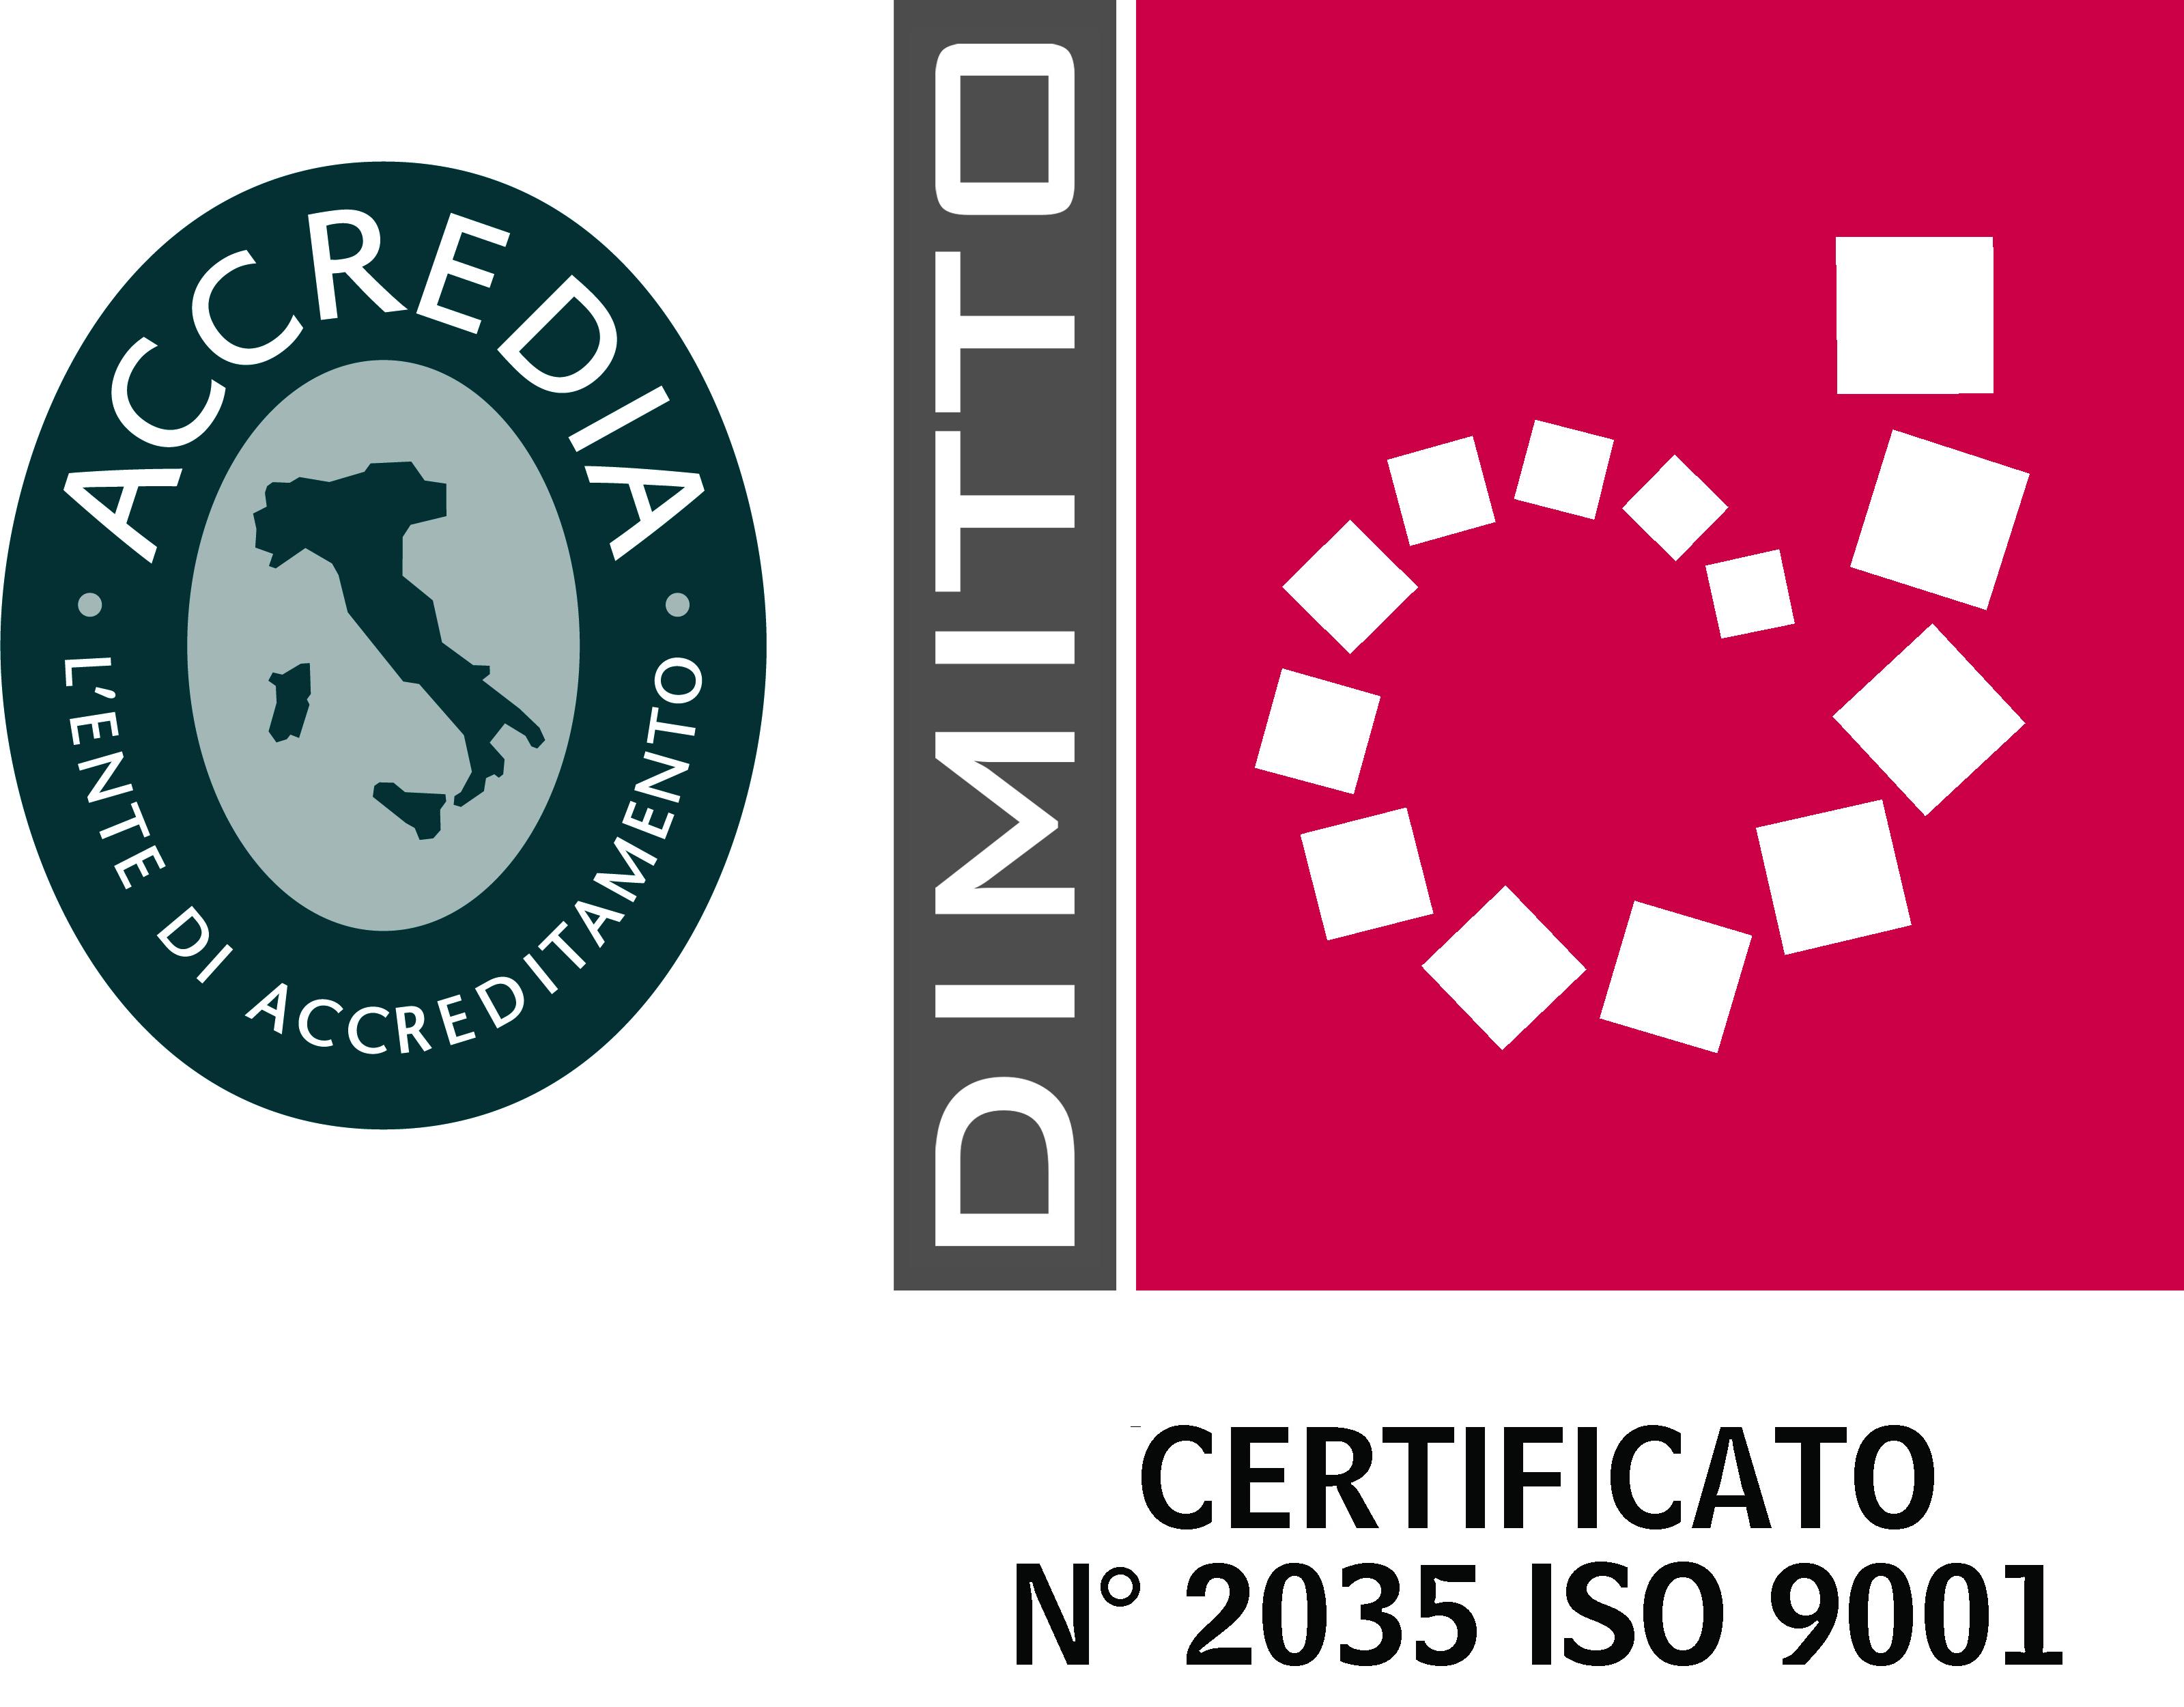 Certification Cps Srl